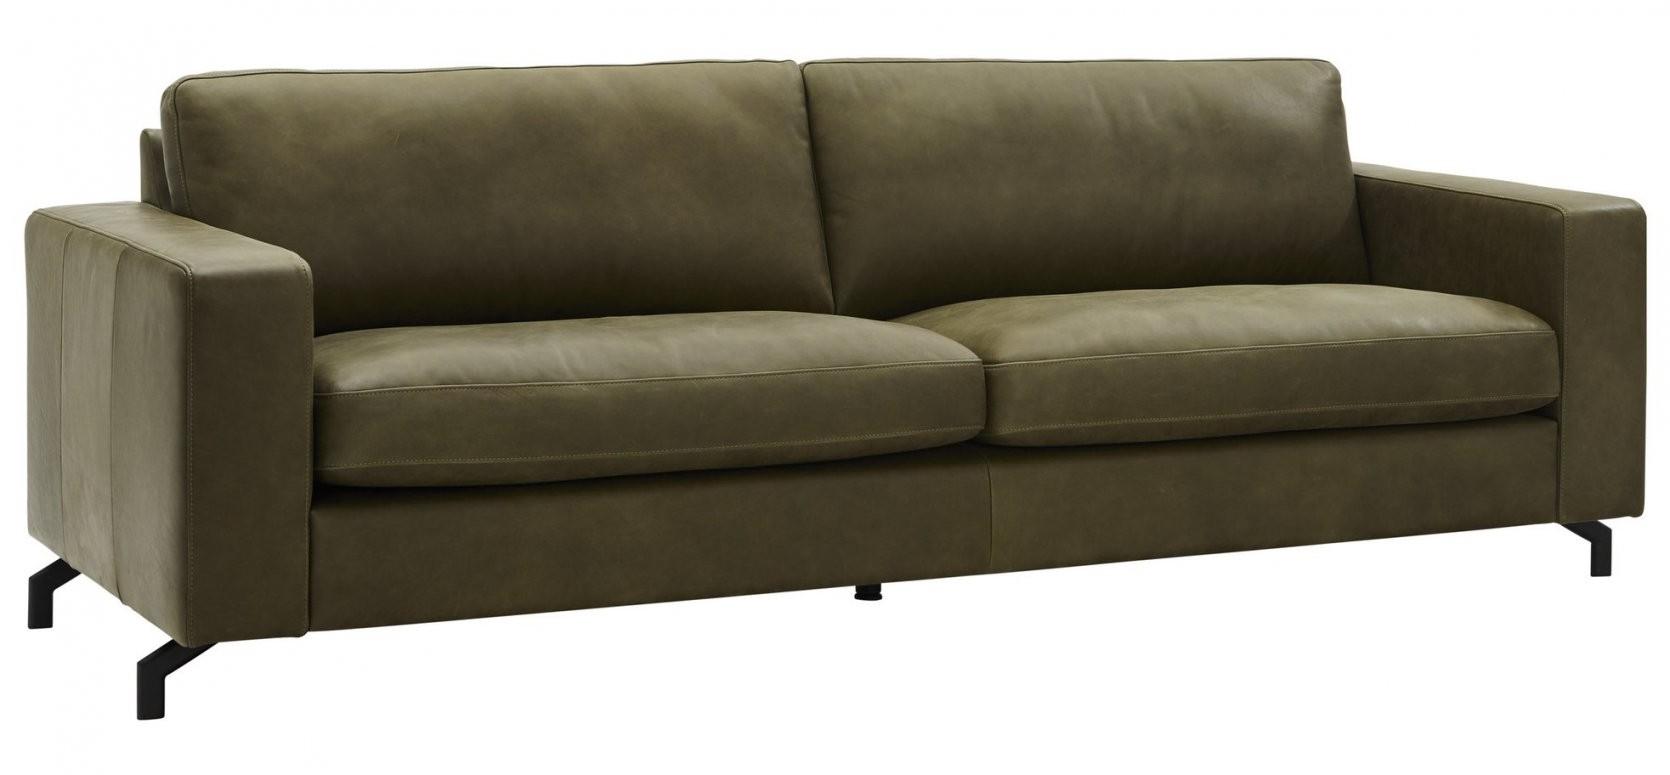 Natura Livingston 4Sitzer In Leder Olivgrün von Sofa 4 Sitzer Leder Photo